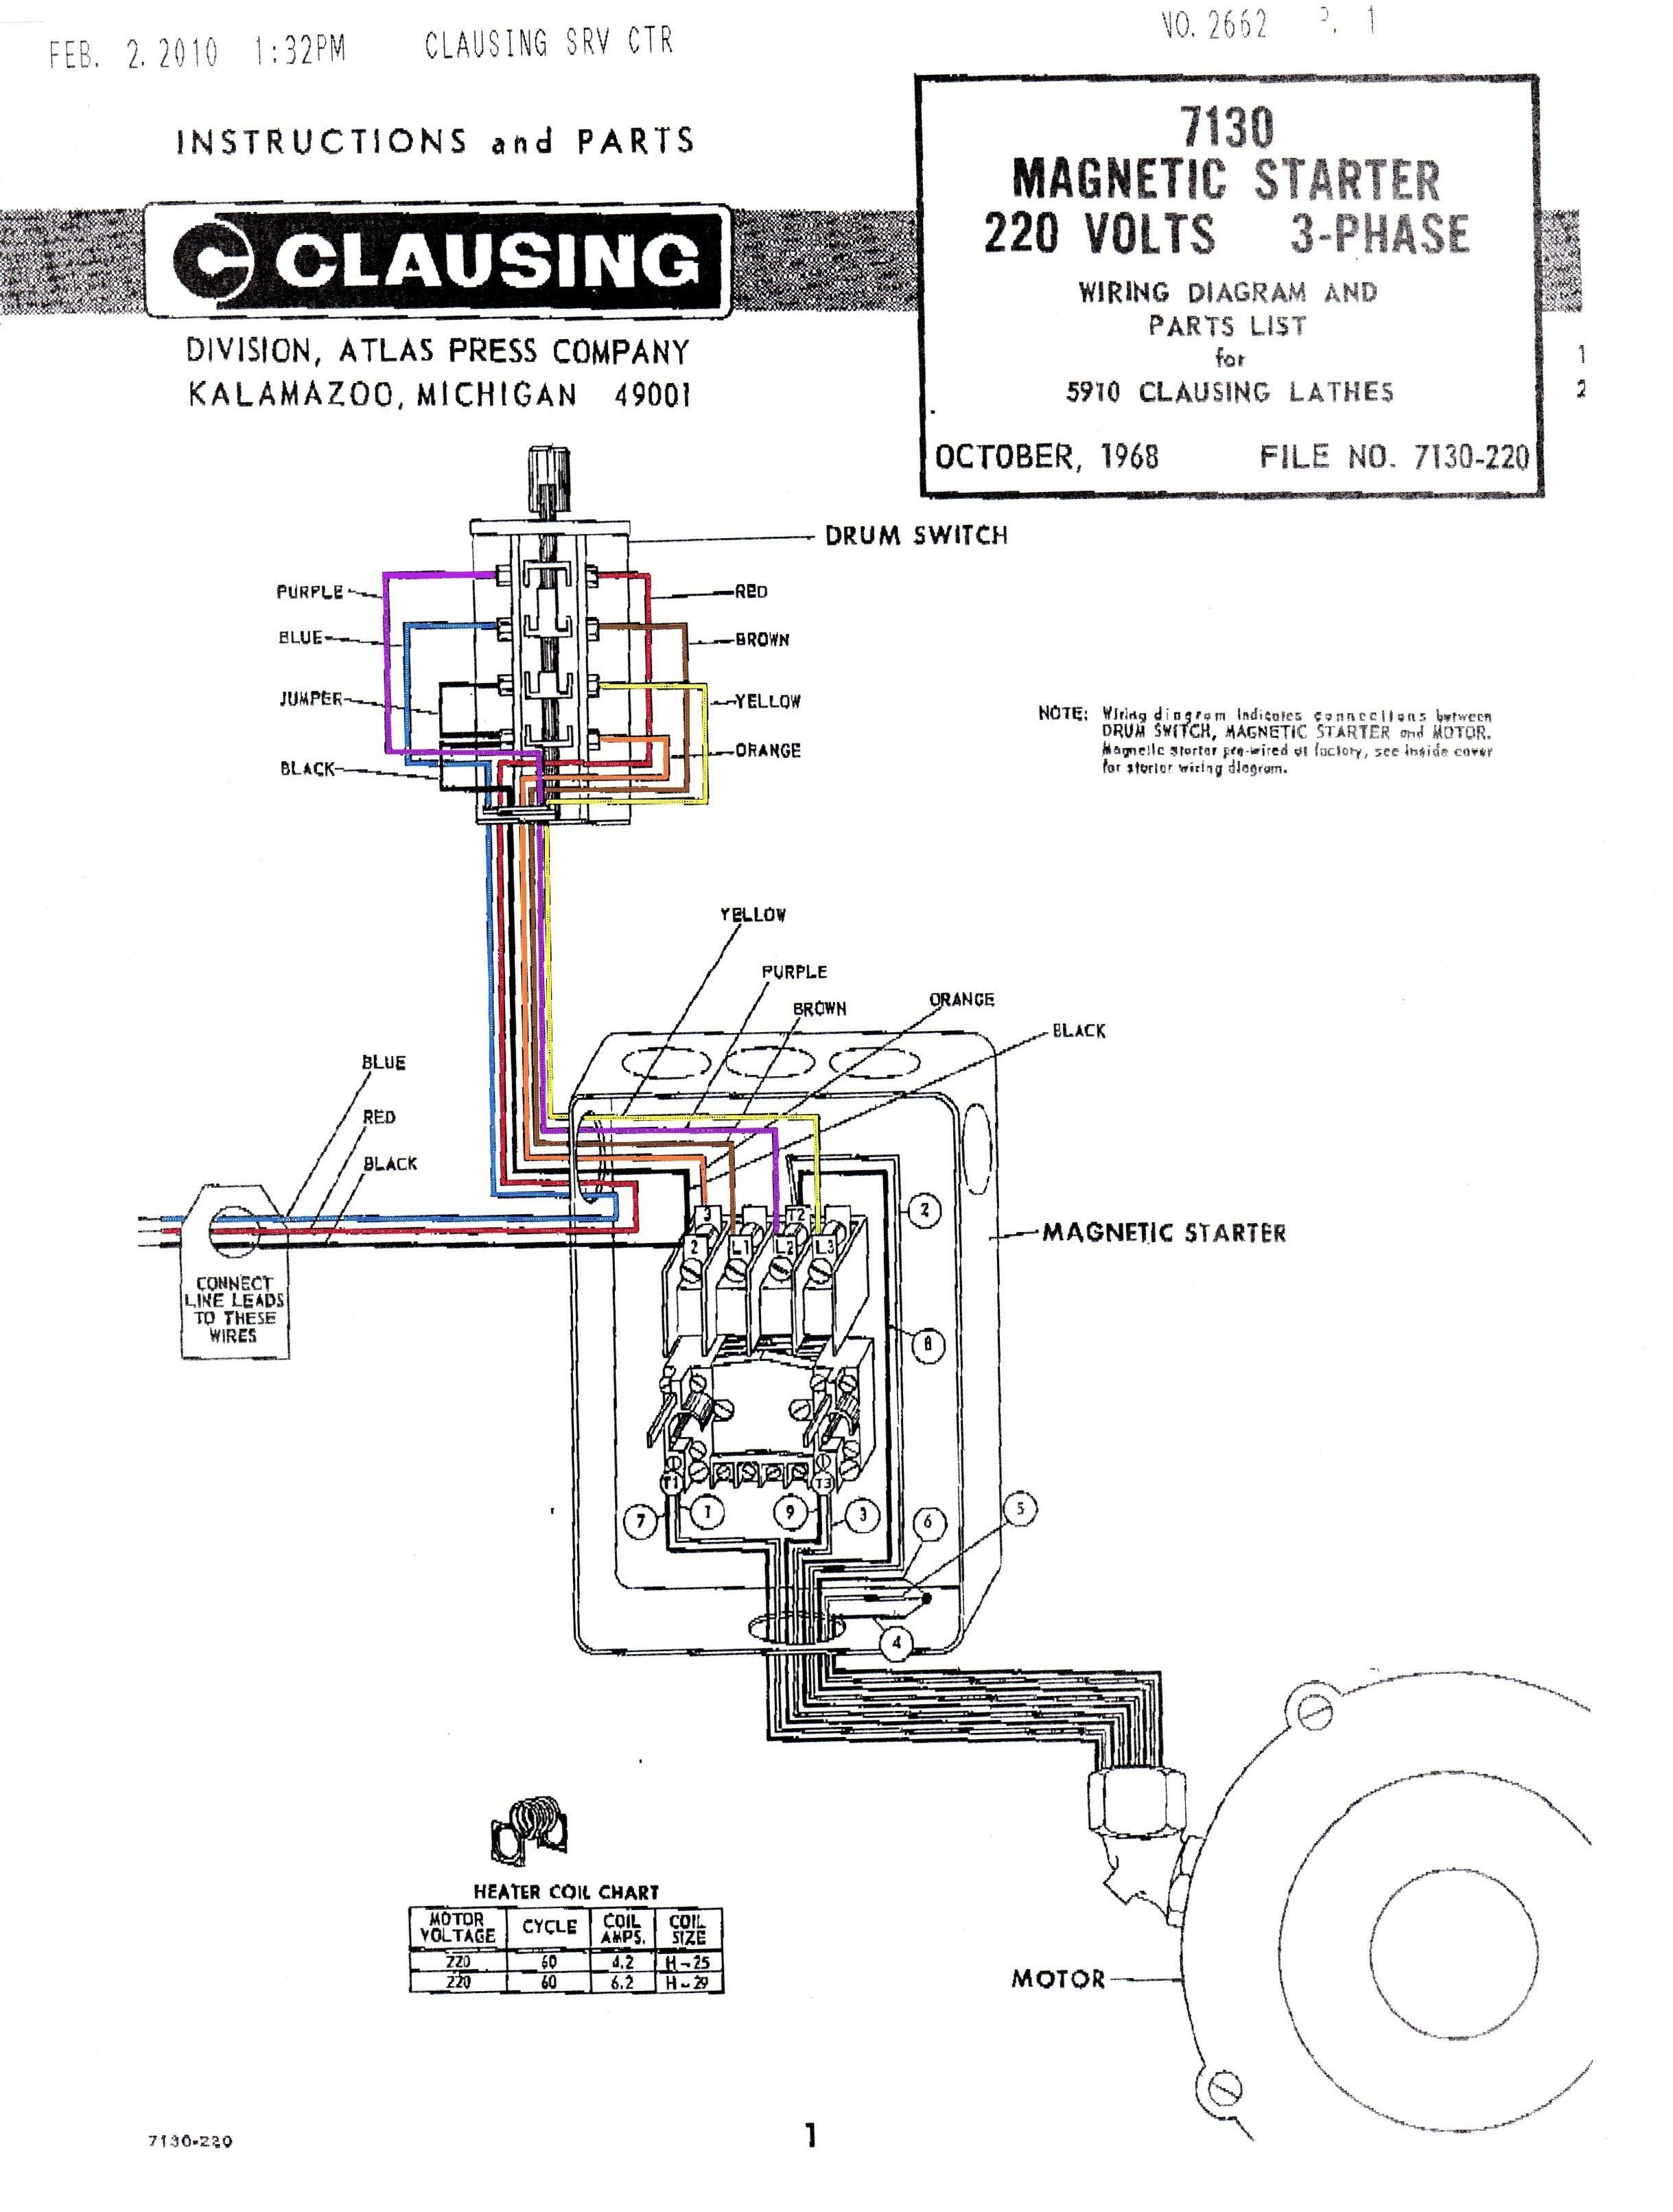 Square D Pressure Switch Wiring Diagram : square, pressure, switch, wiring, diagram, Lovely, Square, Manual, Motor, Starter, Wiring, Diagram, Diagram,, Wire,, Circuit